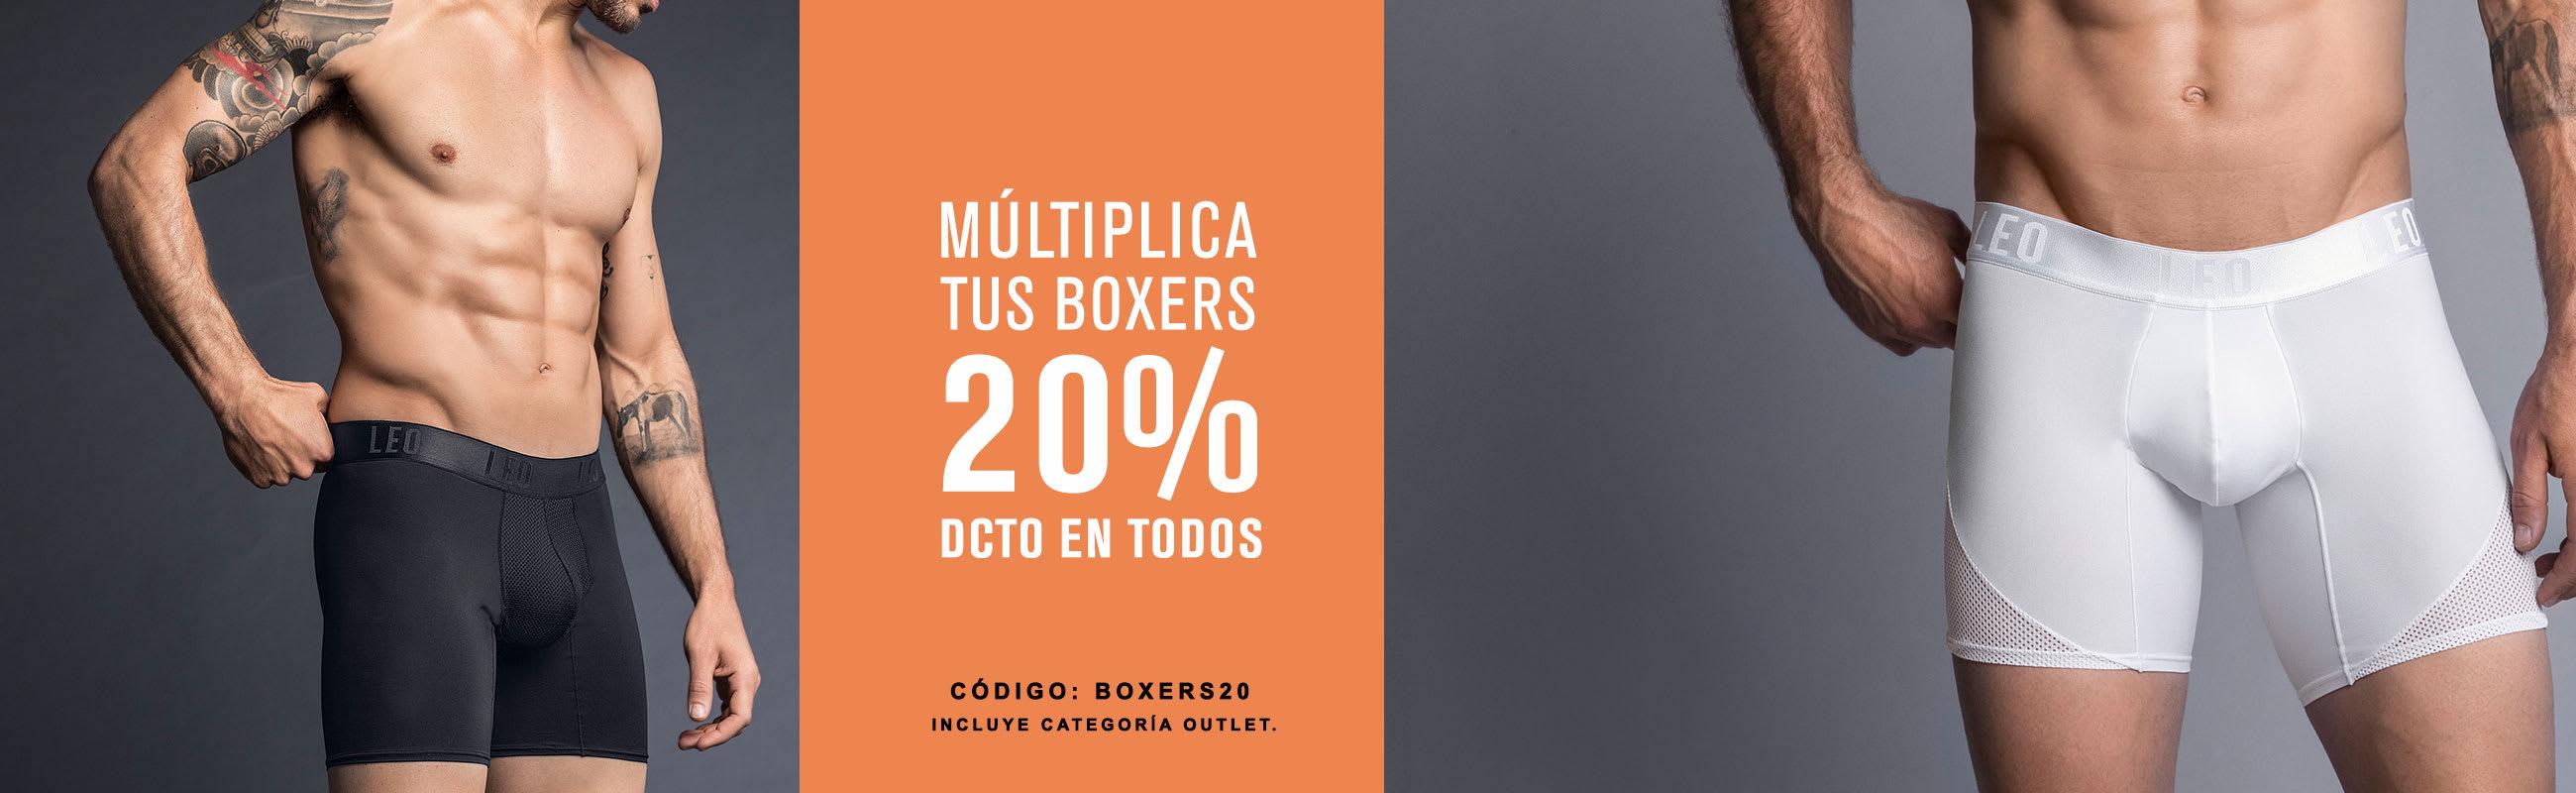 20% DCTO en Boxers